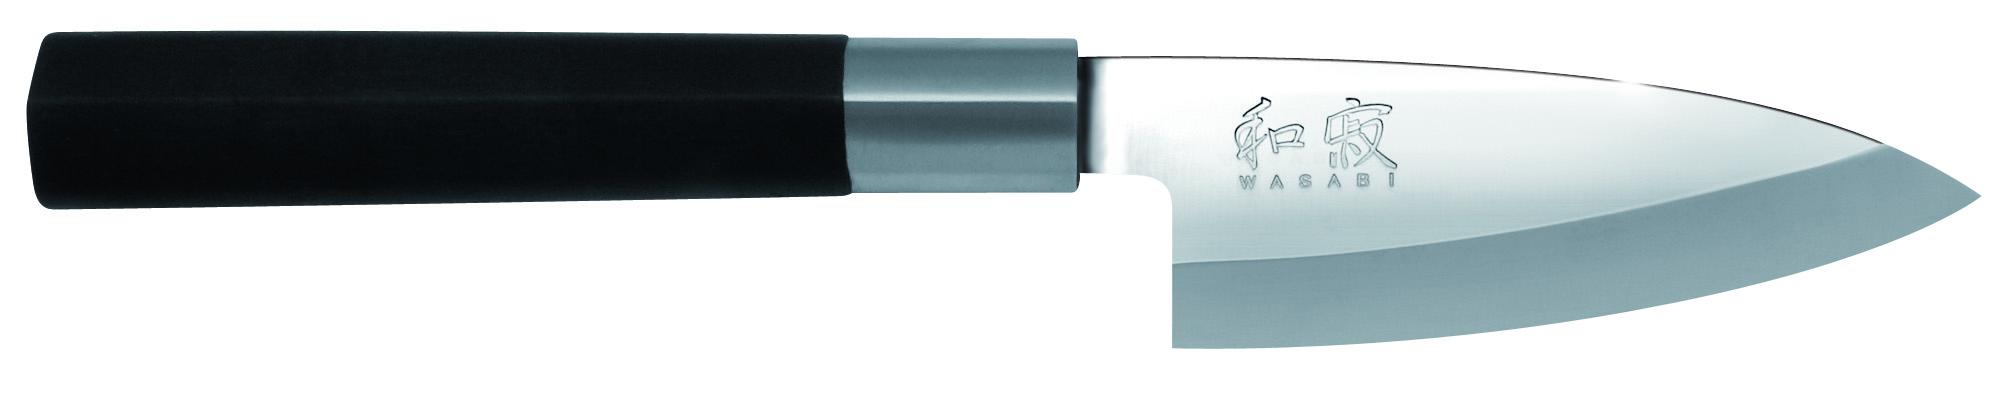 Japonský kuchynský nôž Wasabi Black Deba 6710D